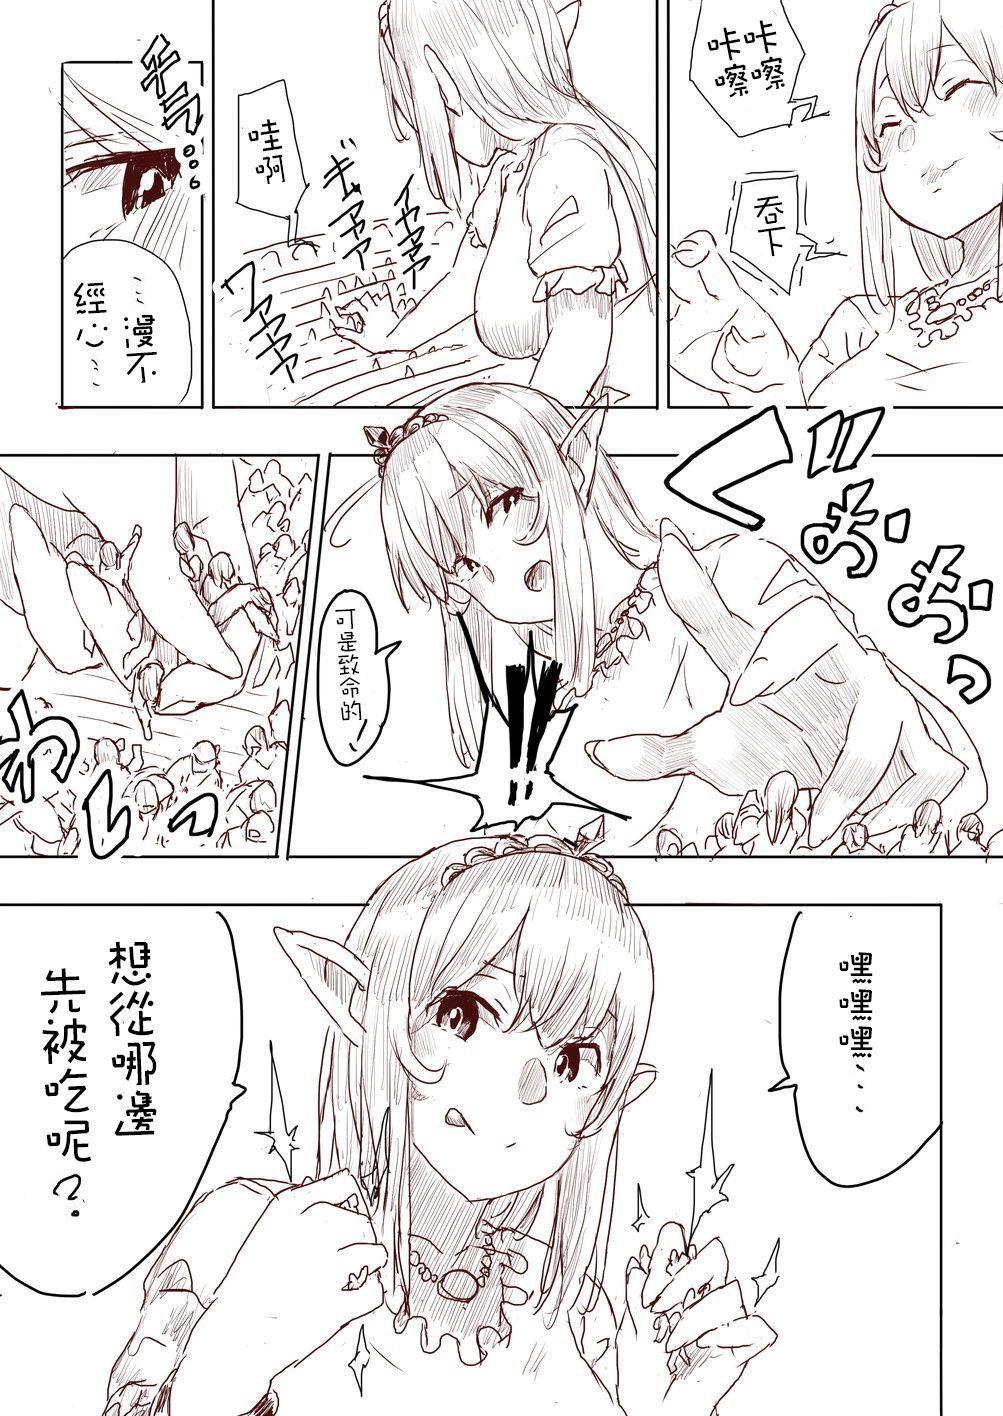 Elf Princess Strikes Back Part1 129